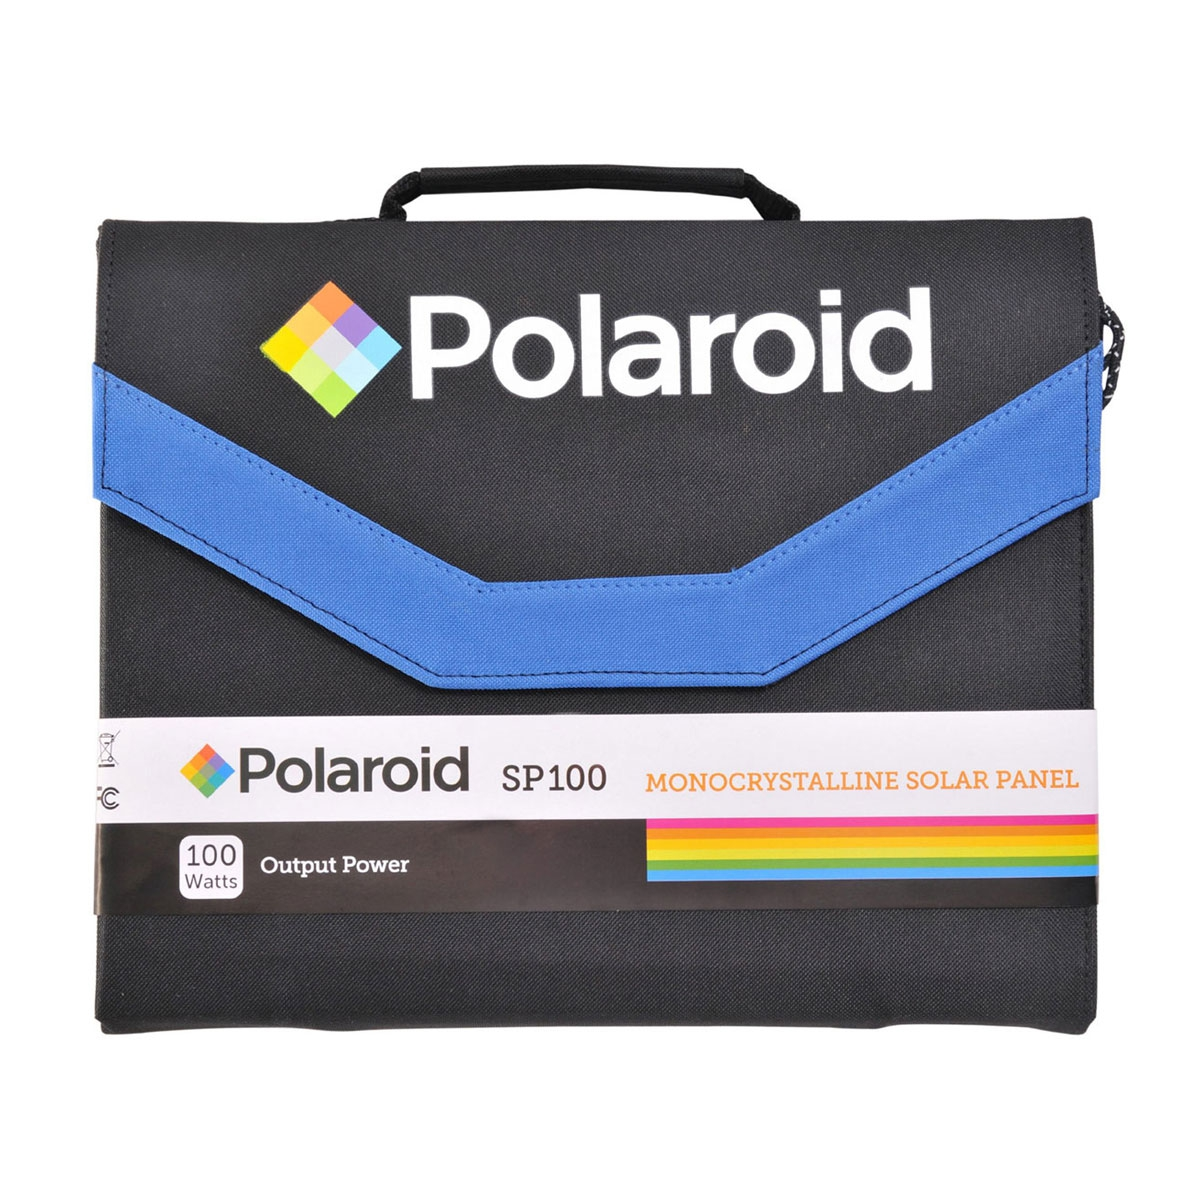 Polaroid SP100 -  faltbares Solarmodul 100Wp